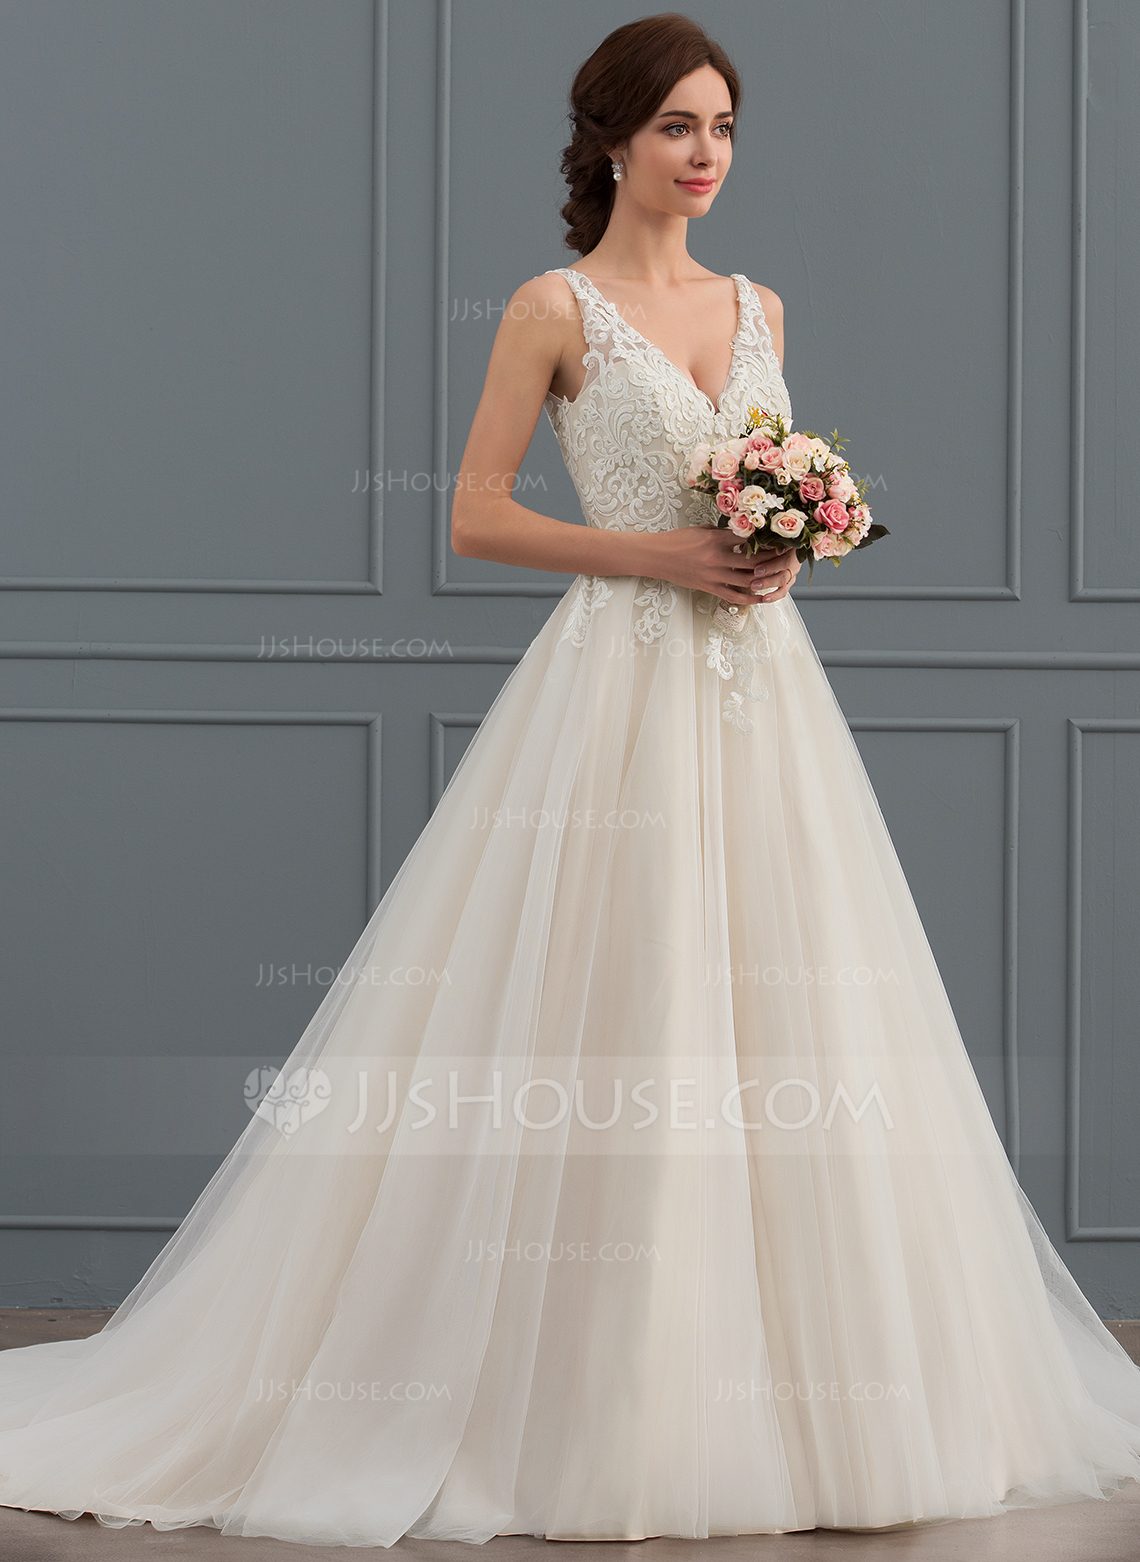 ivory colored wedding dresses photo - 1